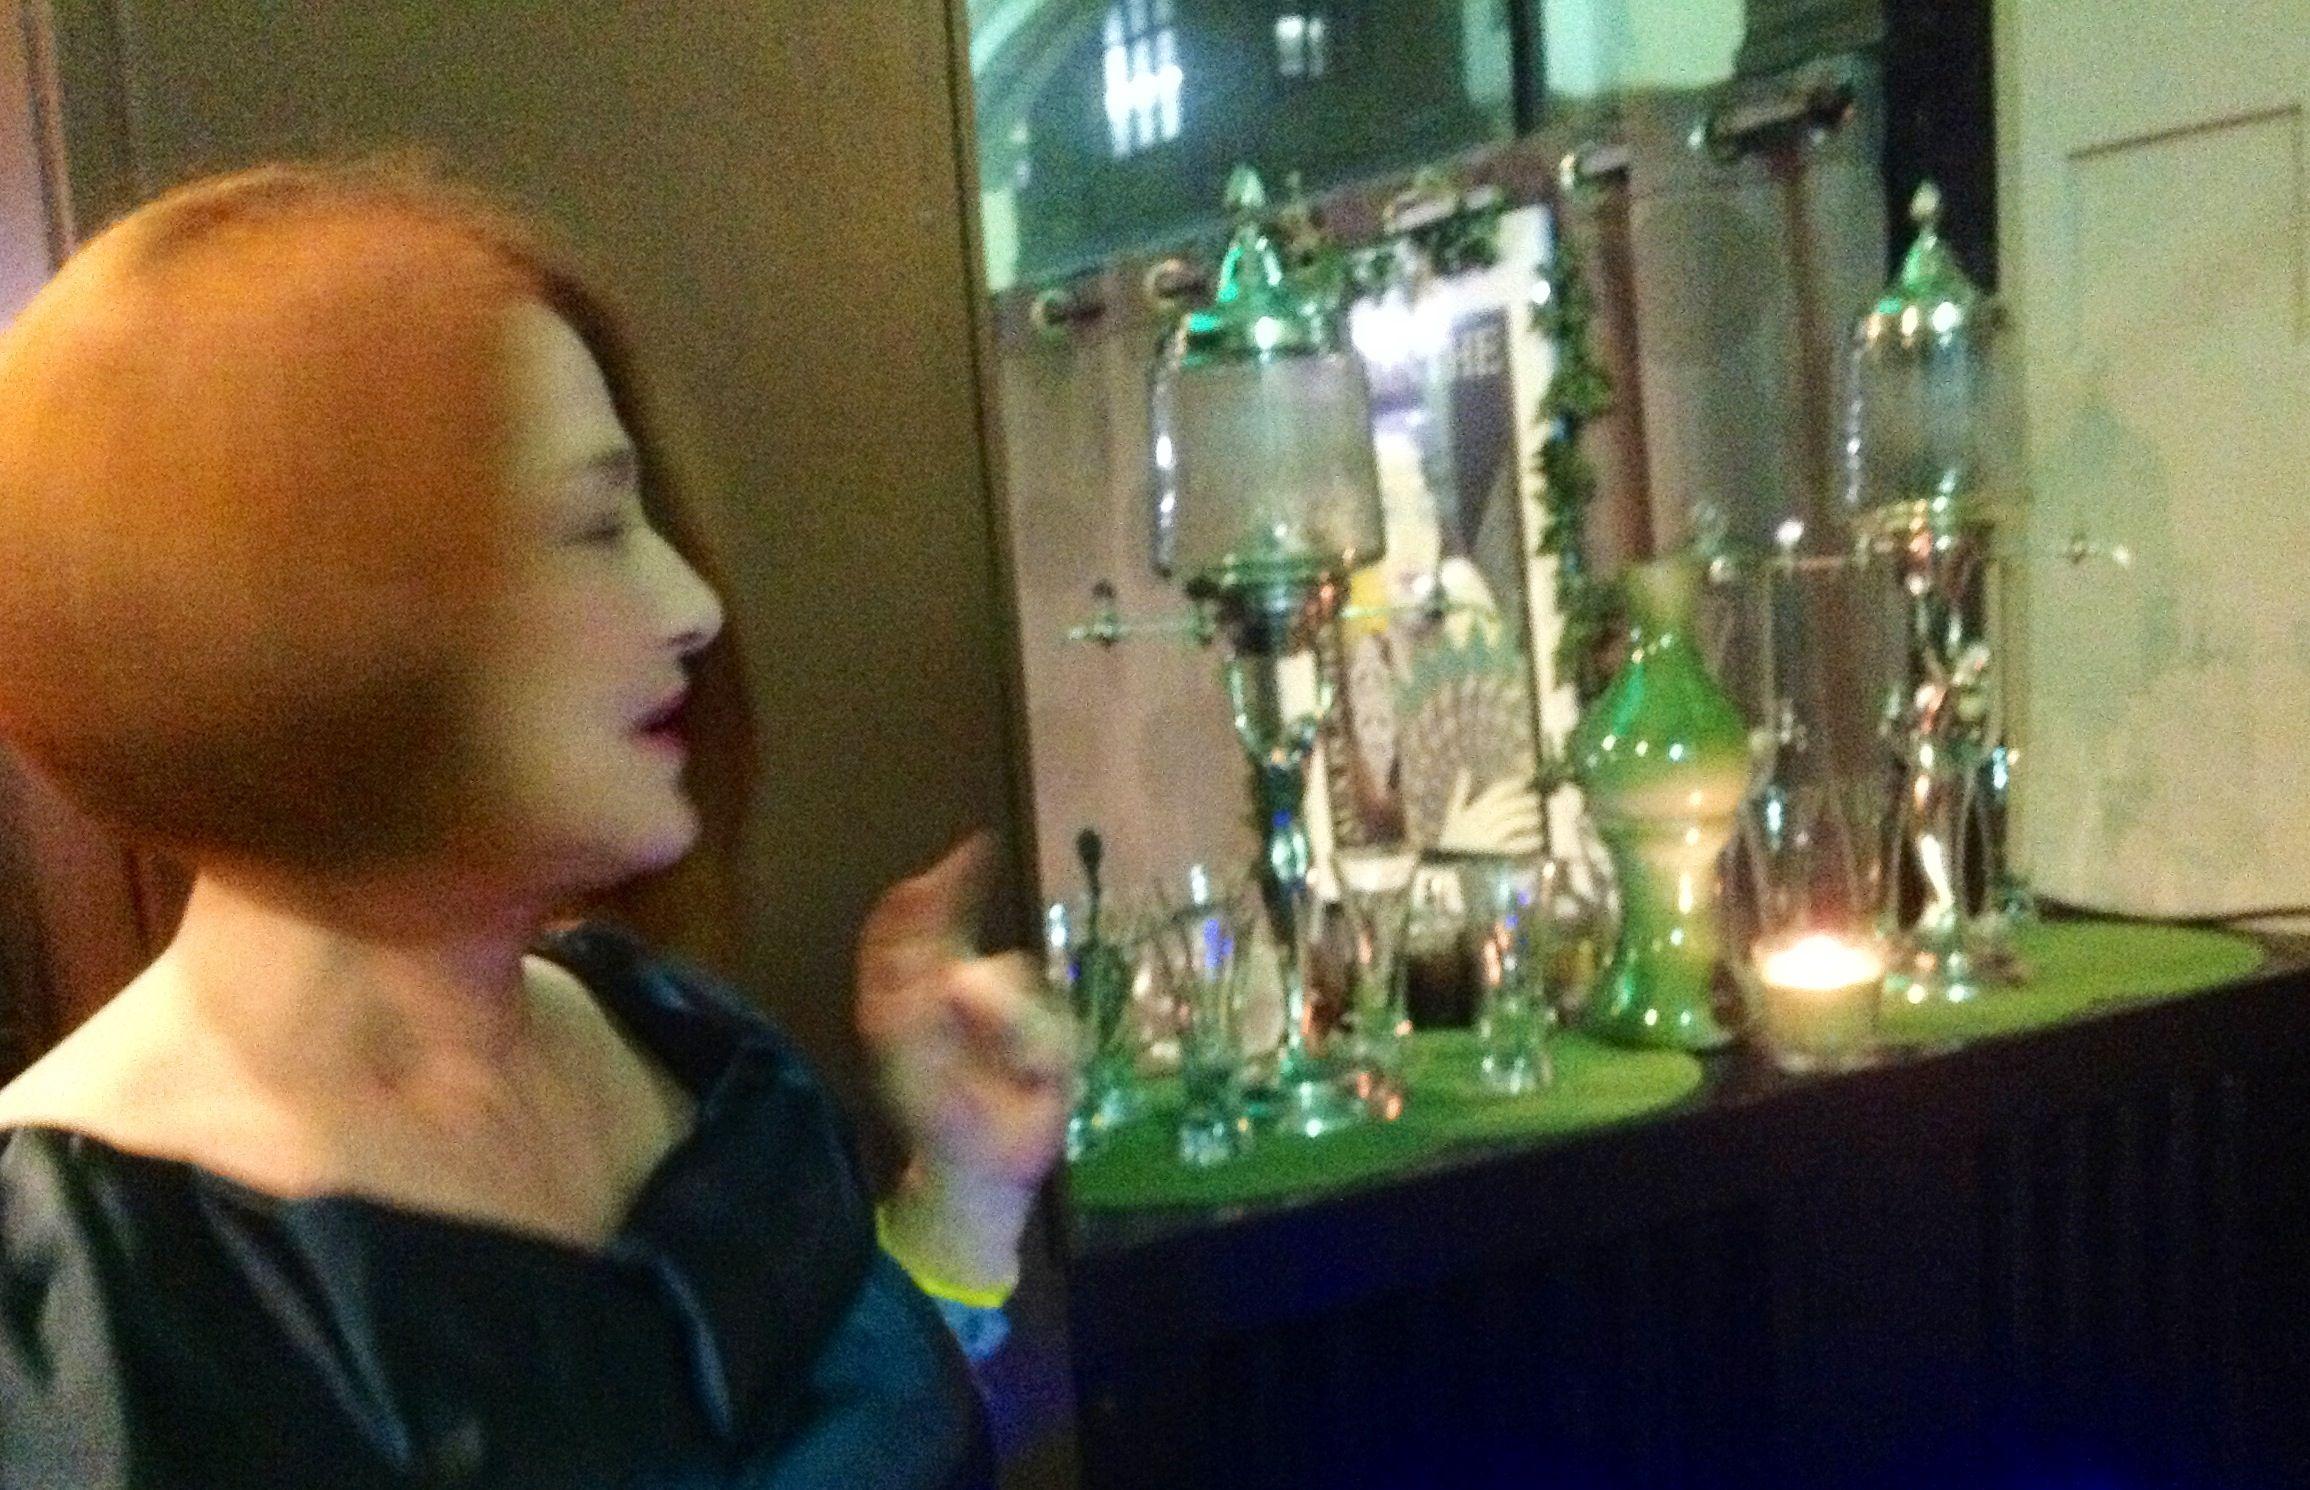 Bar A Absinthes Mistral Tramontane Partenaire De La Soiree Fairyllusion Novelty Lamp Absinthe Lamp